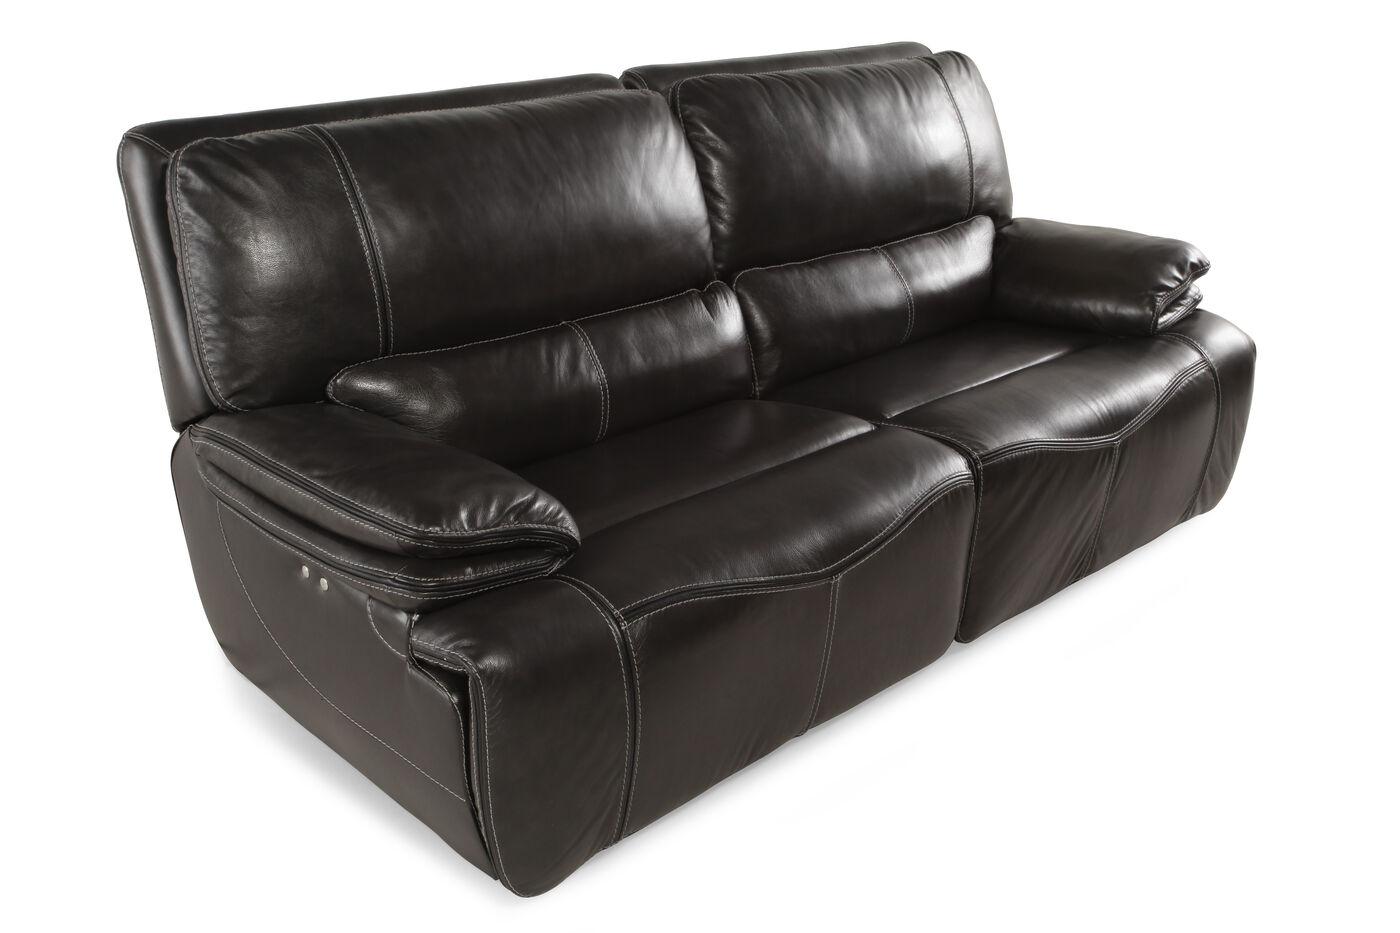 sofa las vegas living room sofas walker furniture las vegas nevada thesofa. Black Bedroom Furniture Sets. Home Design Ideas